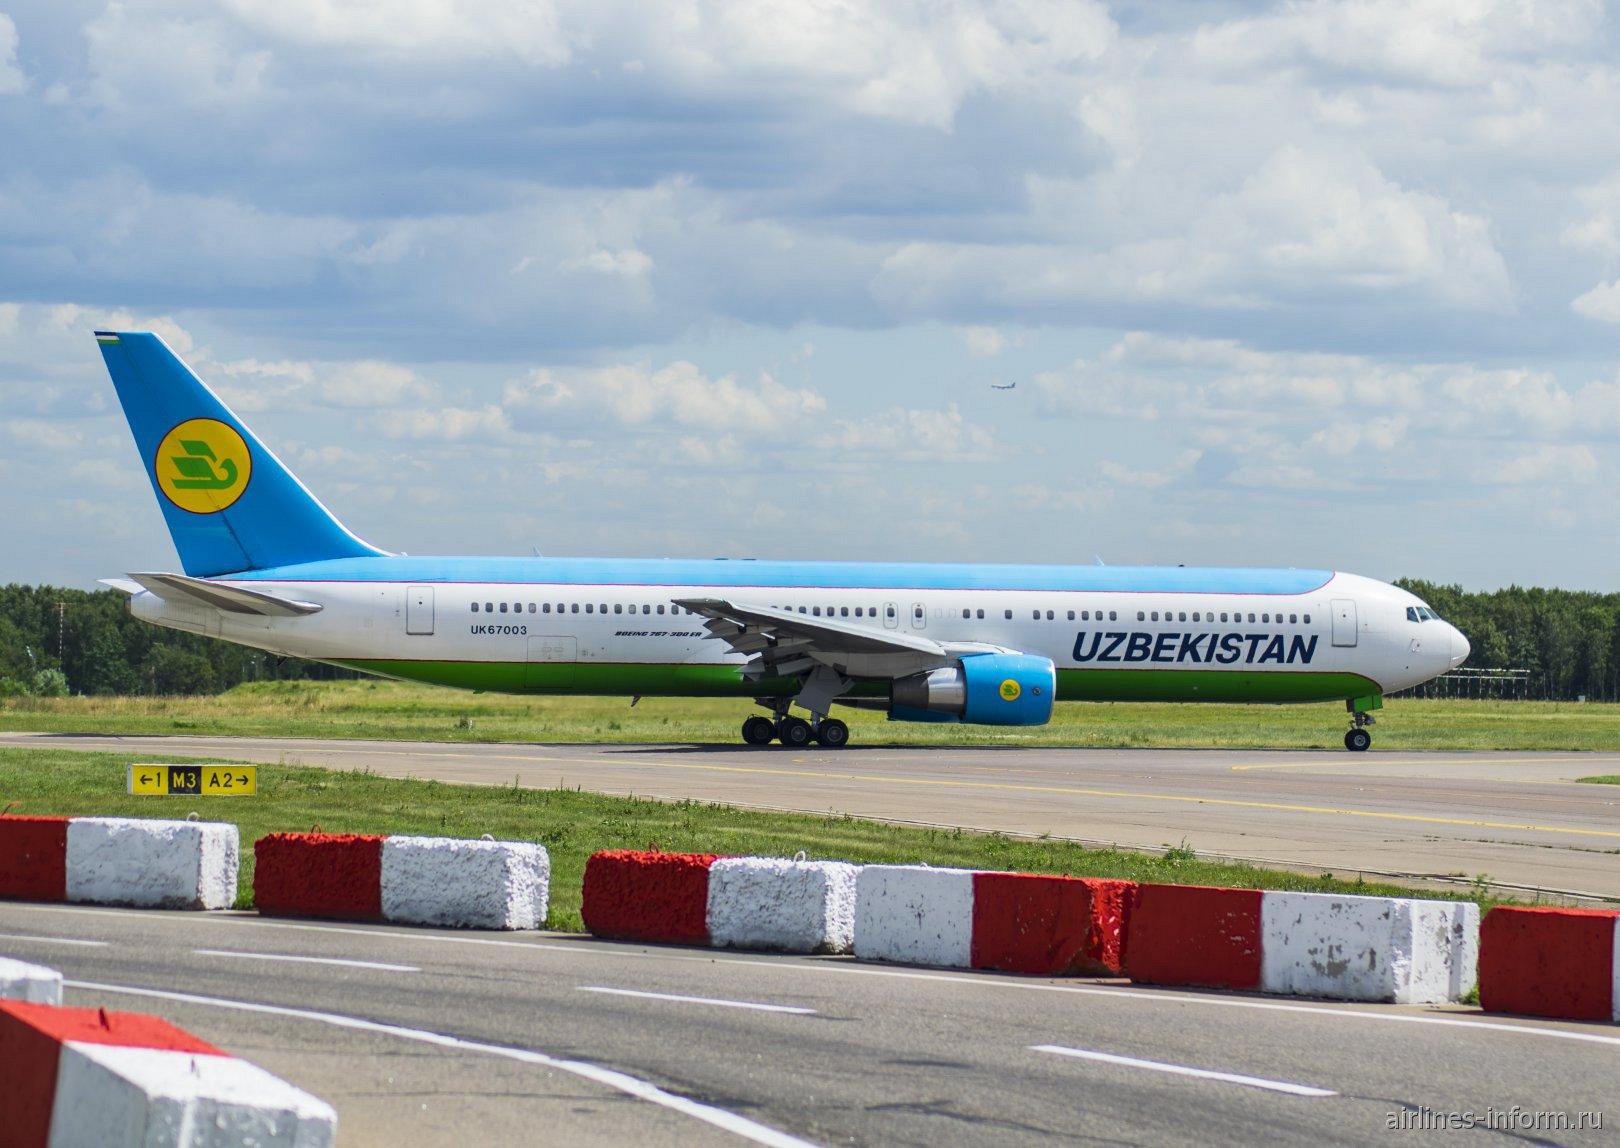 Боинг-767-300 UK67003 Узбекских авиалиний в аэропорту Внуково